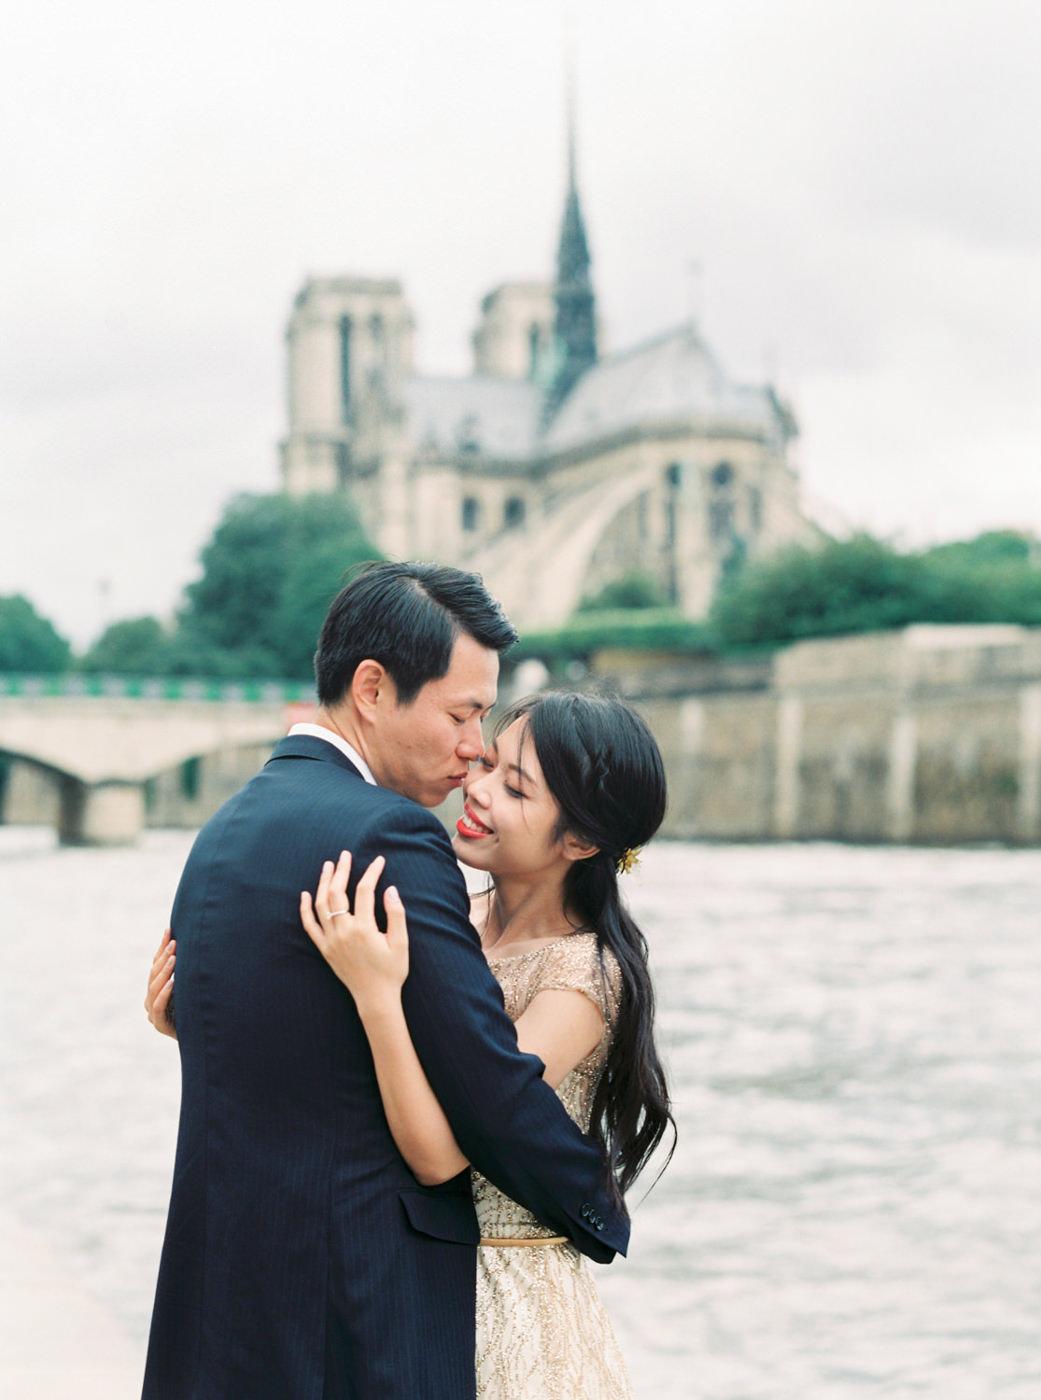 Paris_Wedding_Photographer_de_Seine_Elopment_Photoshoot_Engageme